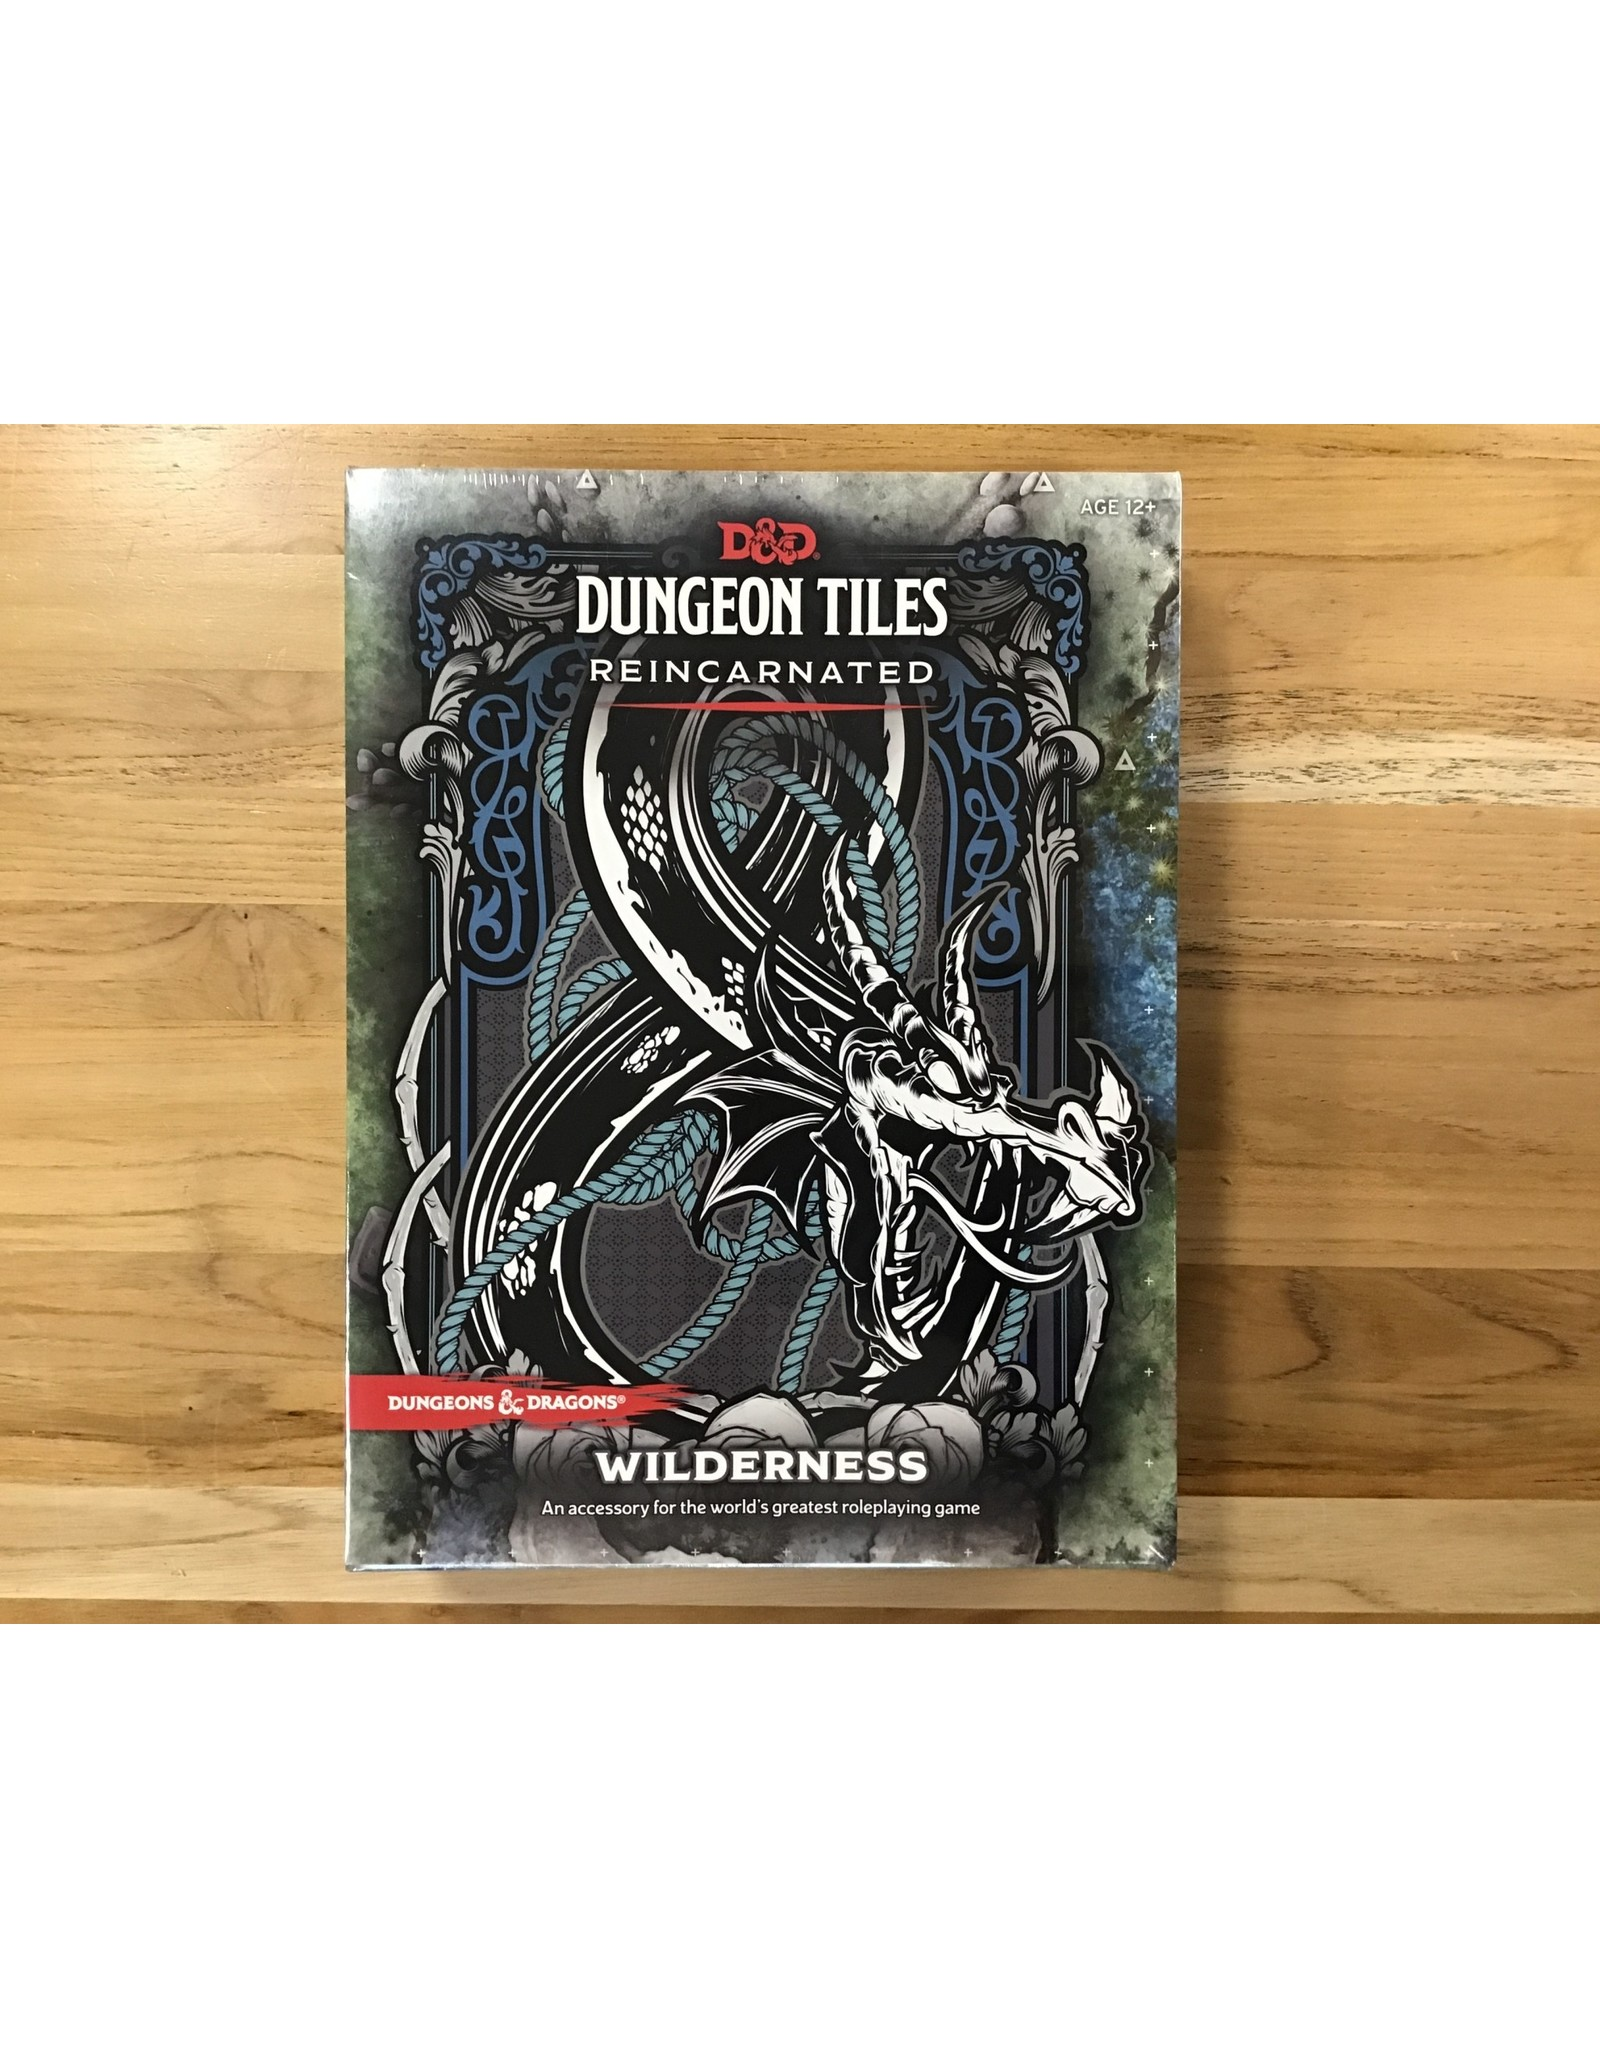 Dungeon Tiles Reincarnated: Wilderness